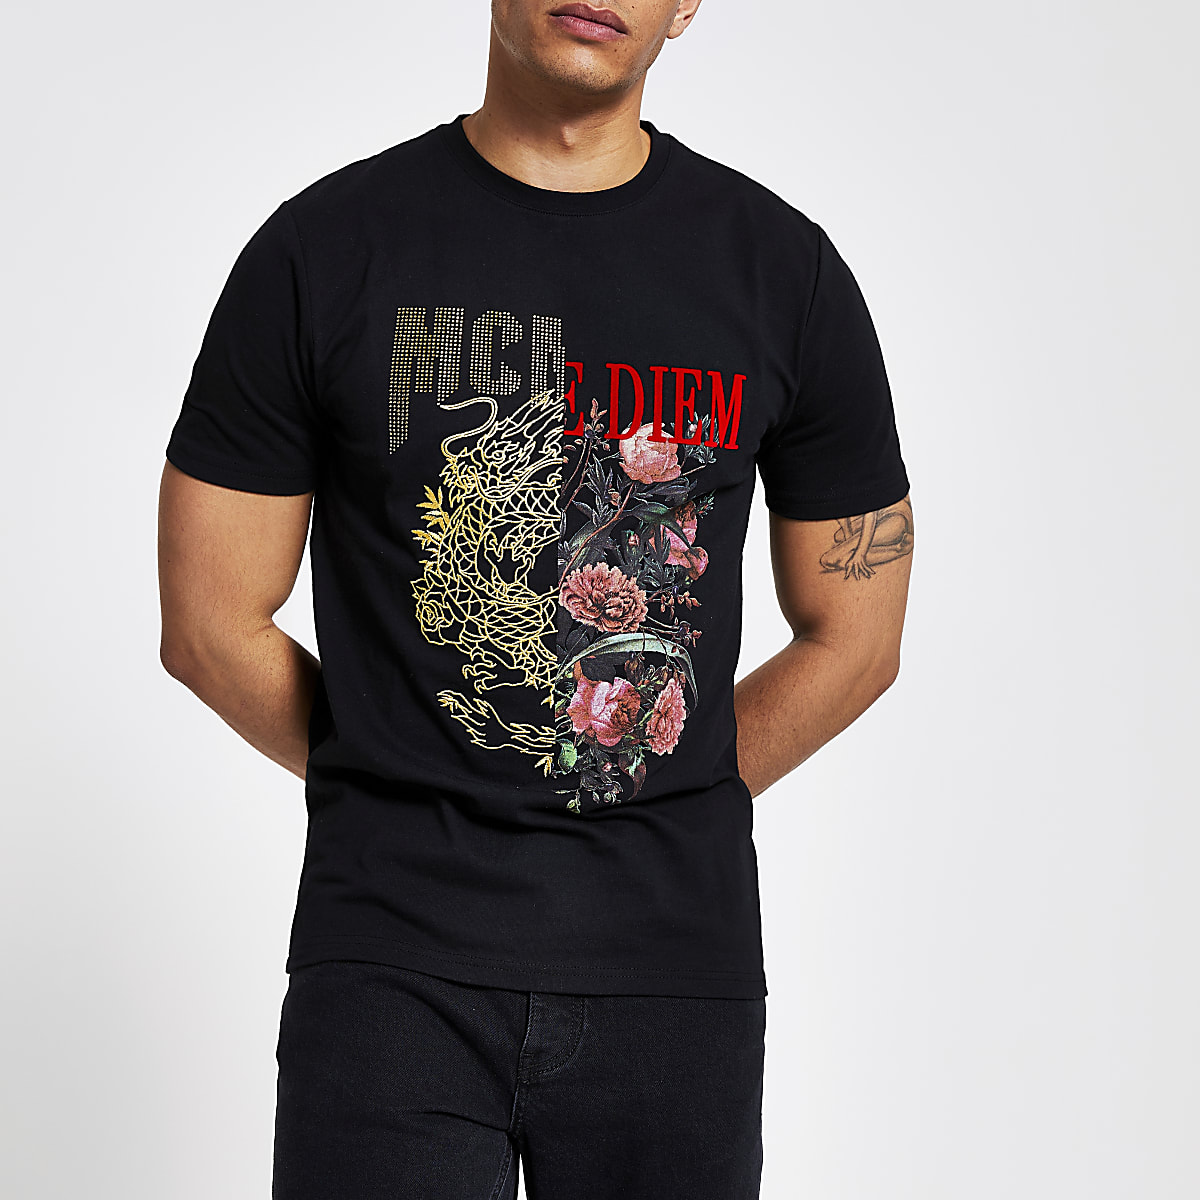 Black spliced printed slim fit T-shirt